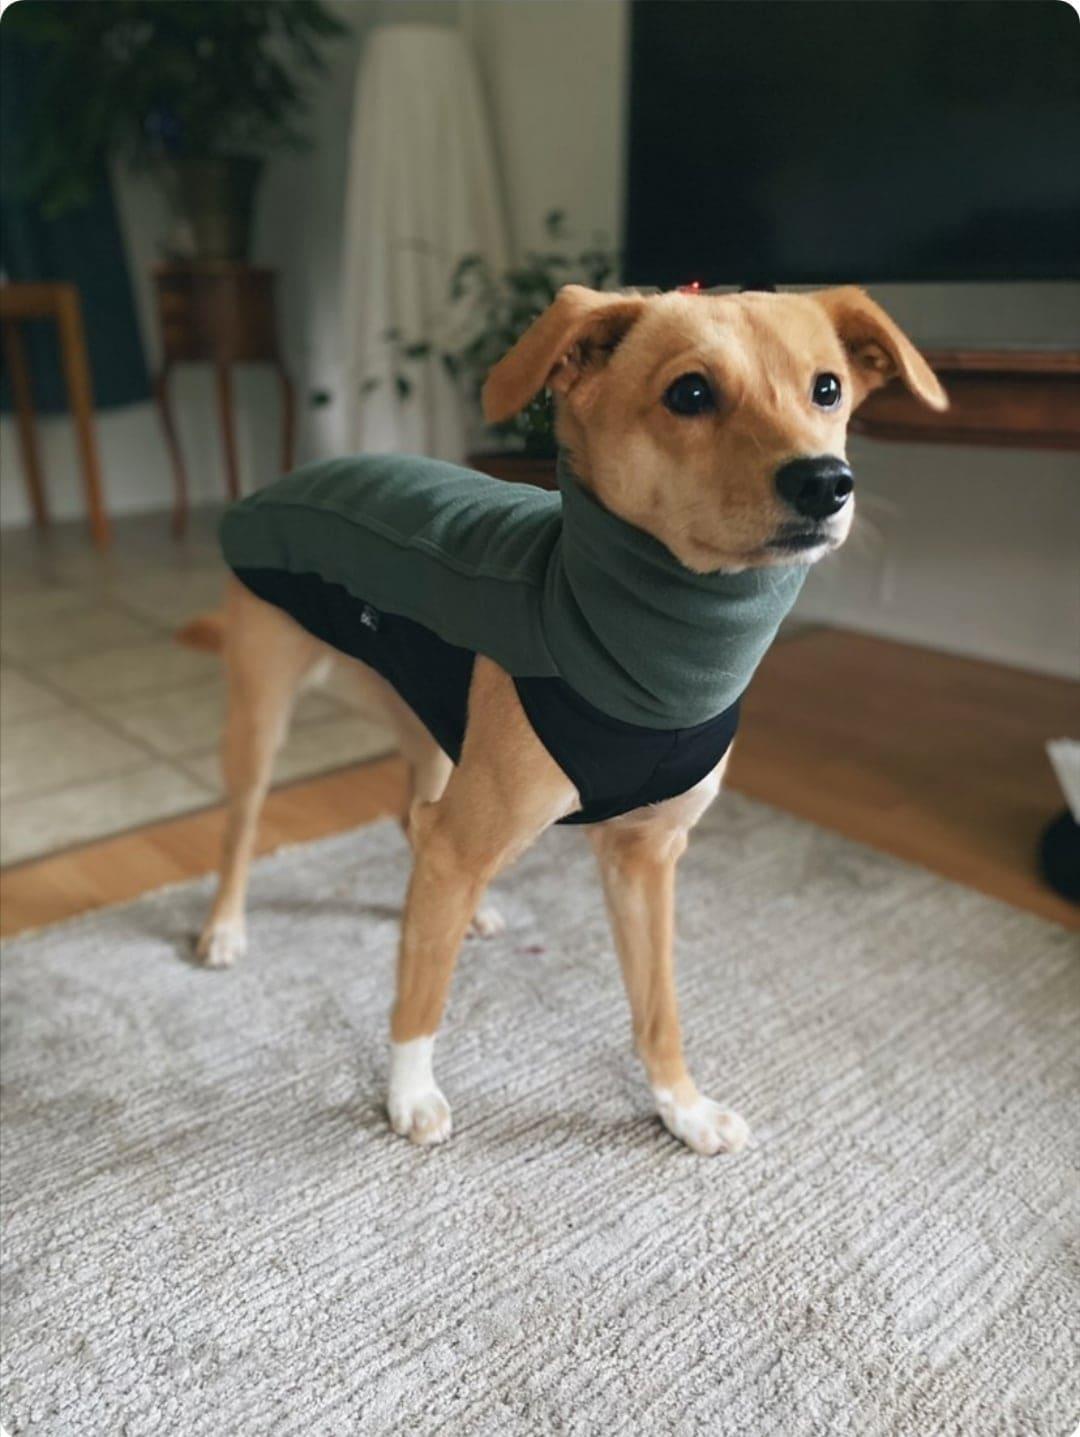 Sighthound Fleece Jumper in Olive